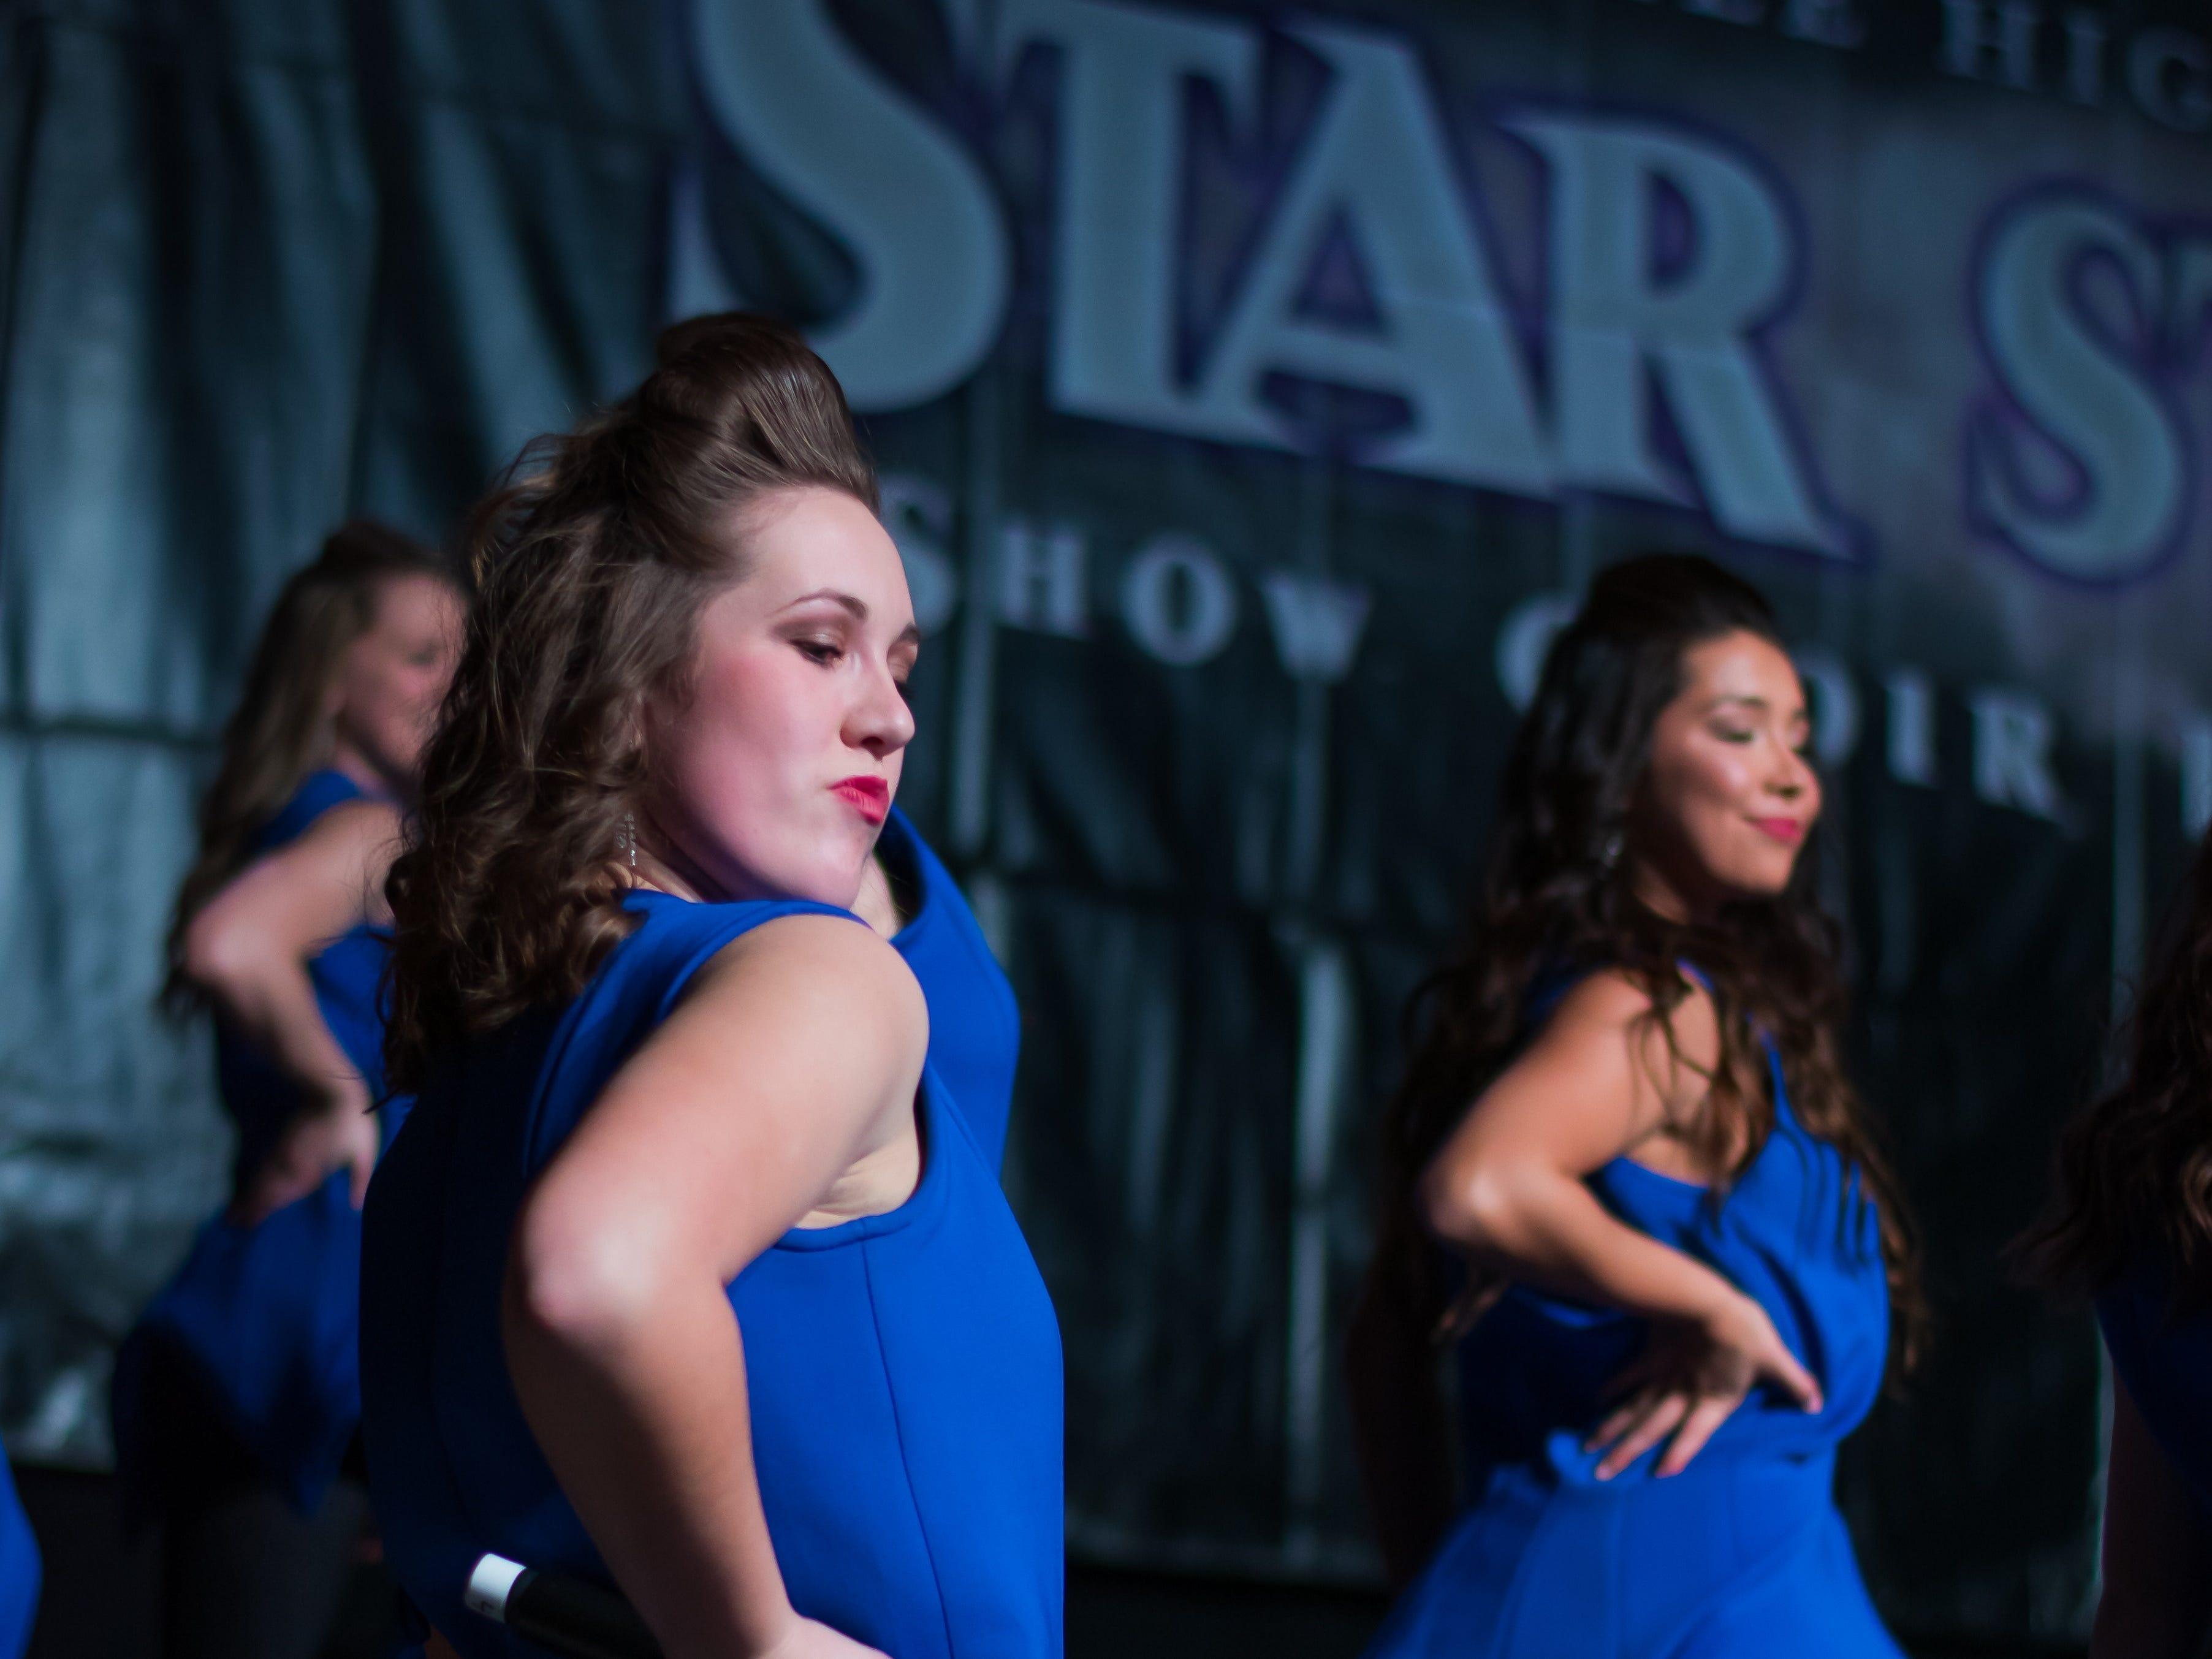 Waukee show choir group Millennium performs on Saturday, Jan. 12, 2019 at the Waukee Star Struck Show Choir Invitational in the Waukee High School Field House.